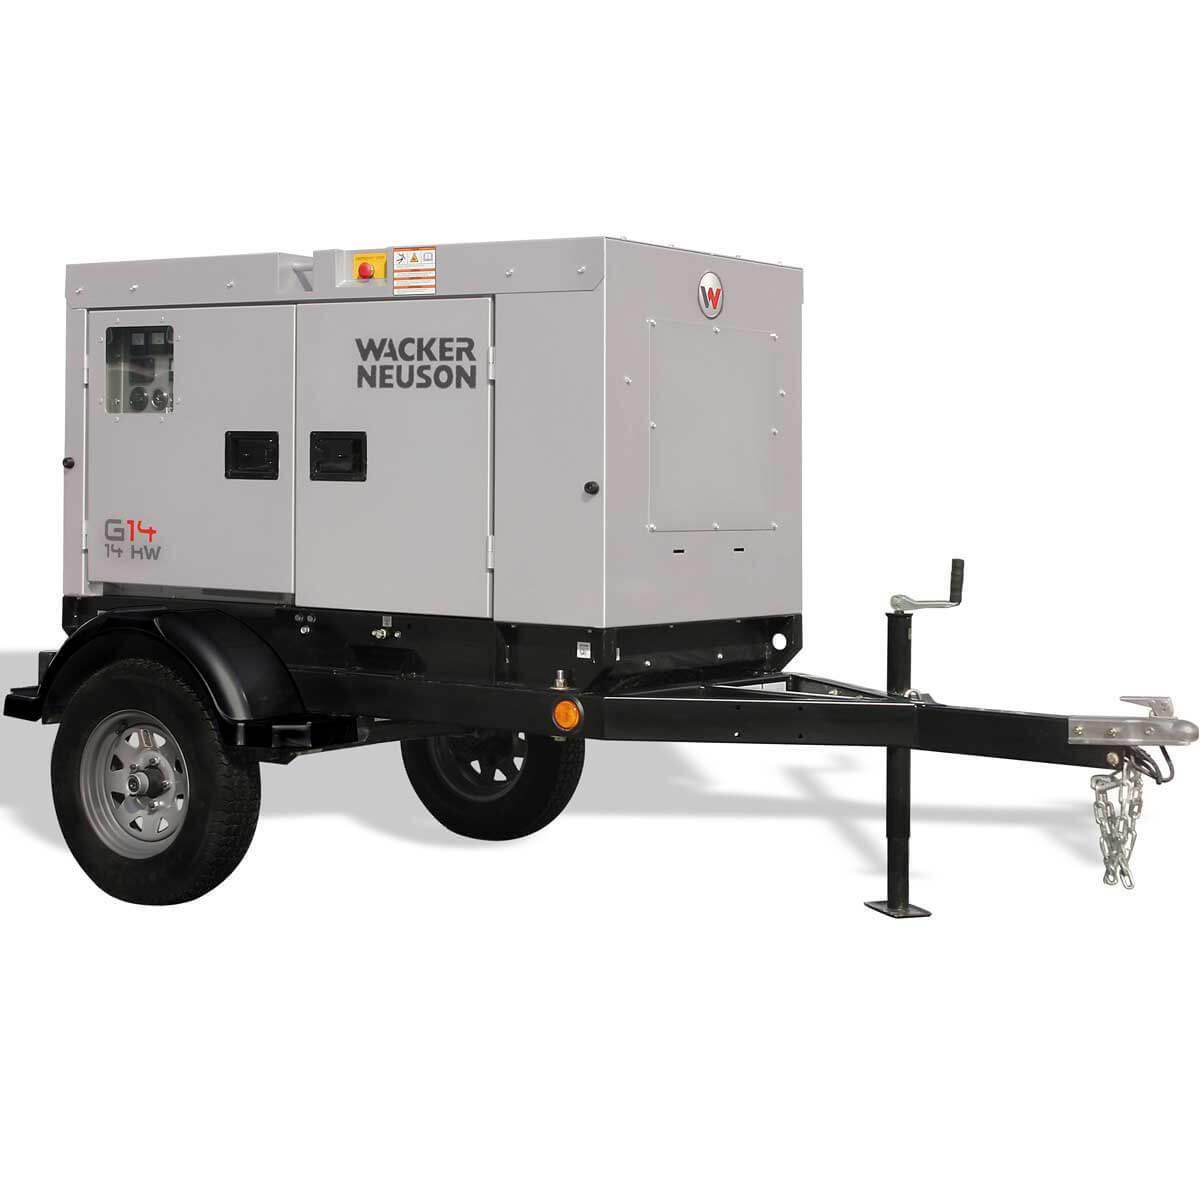 Wacker Neuson G 14 Mobile Generator 14kW